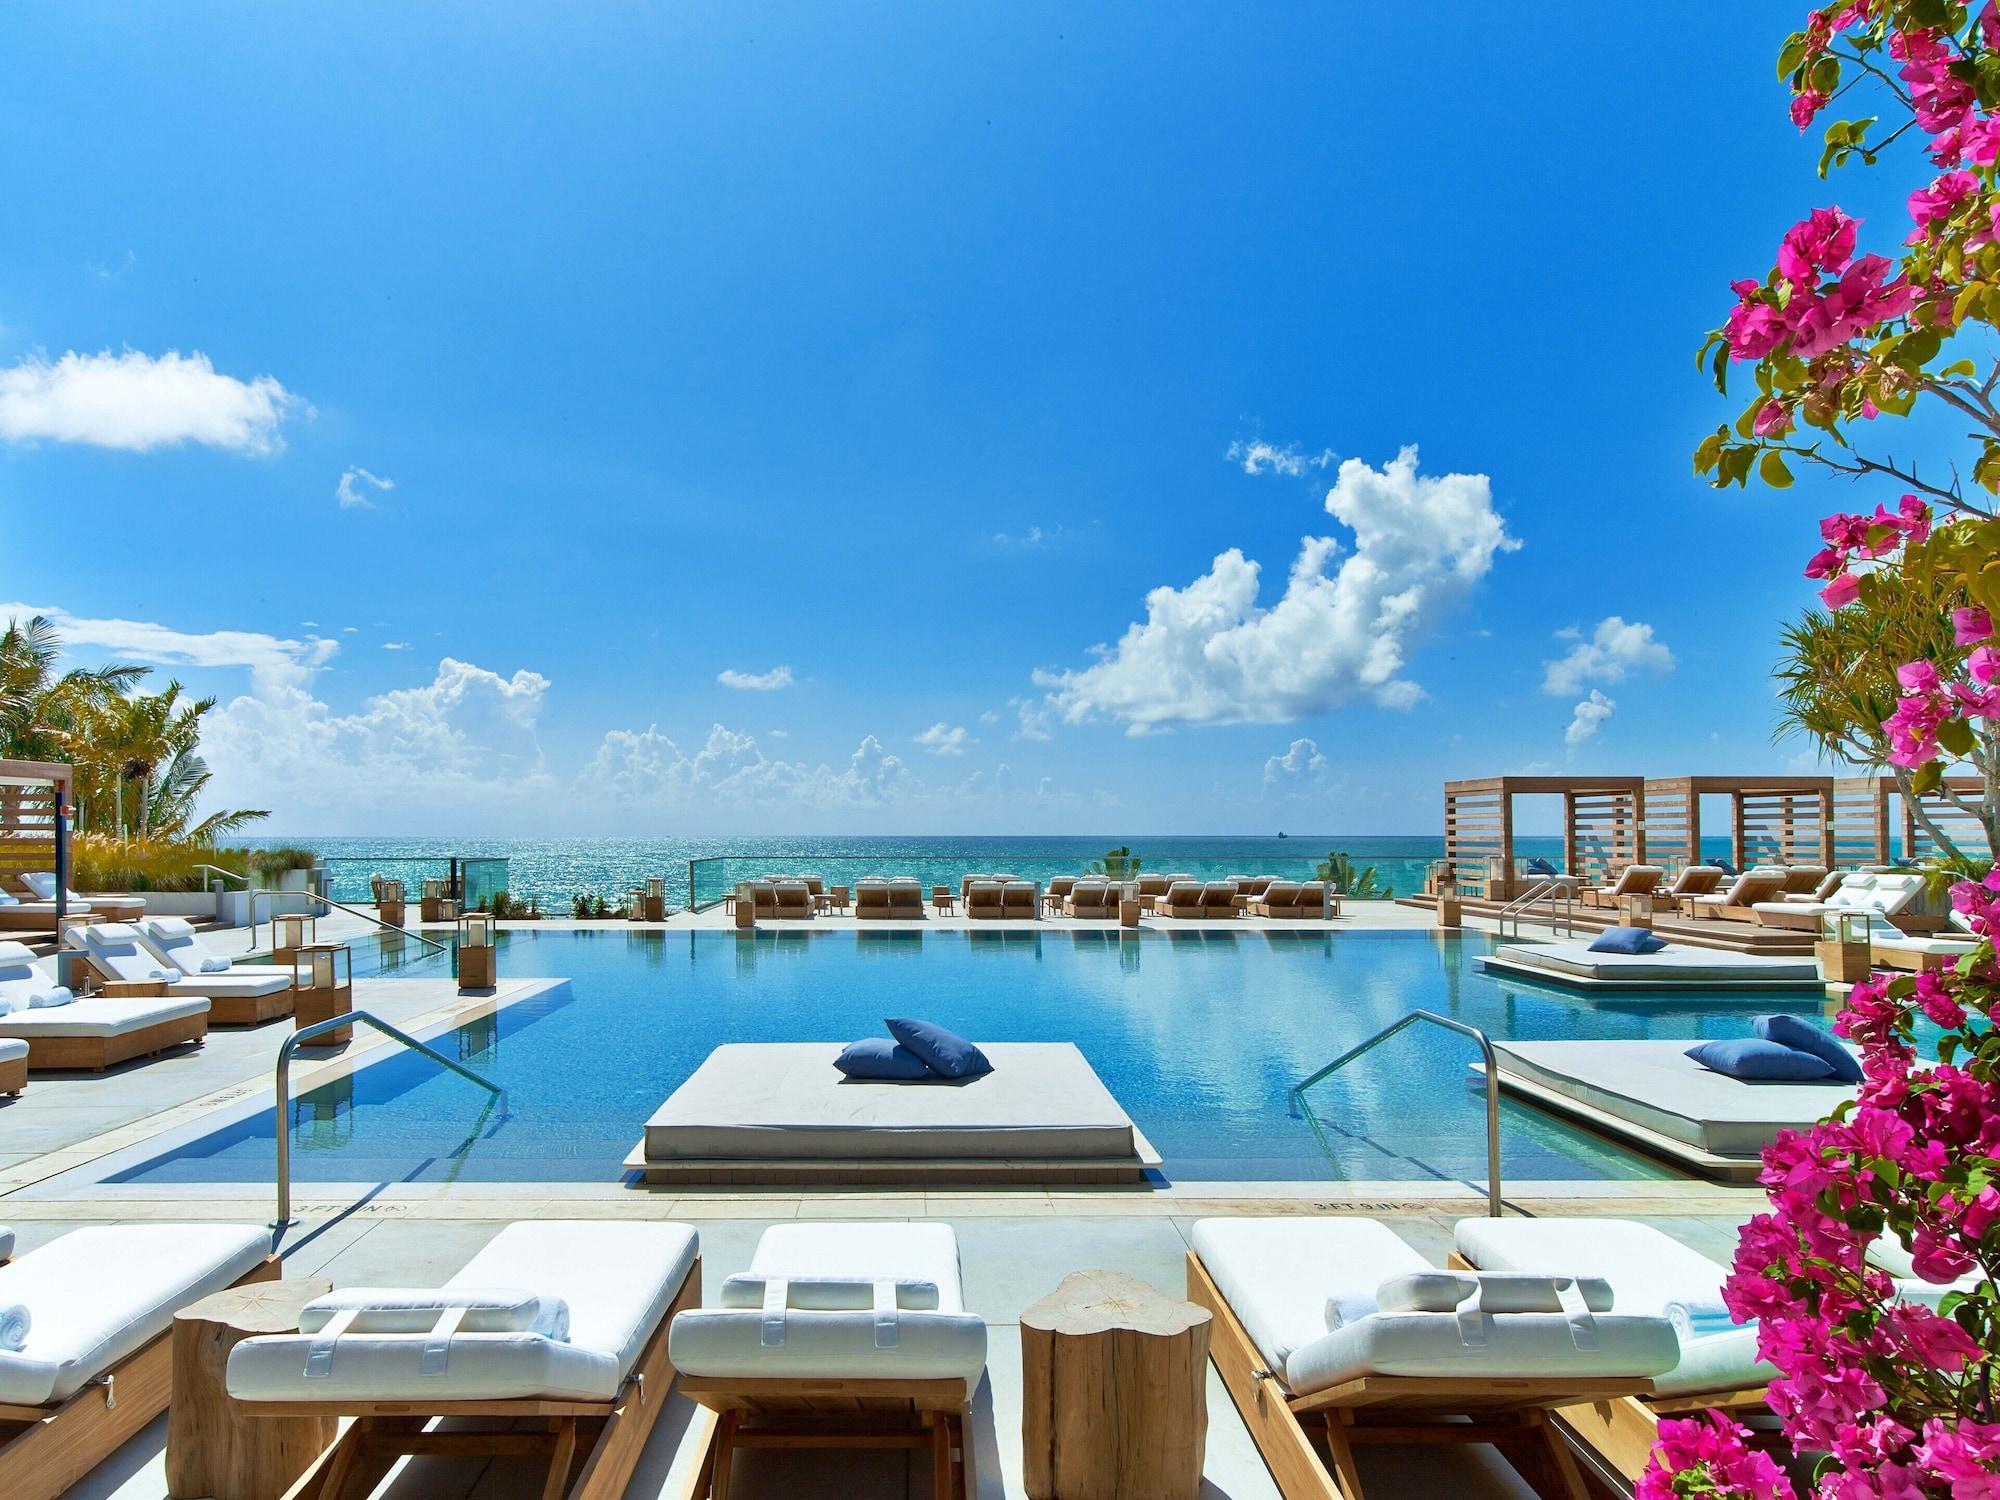 1 Hotel South Beach, Miami-Dade